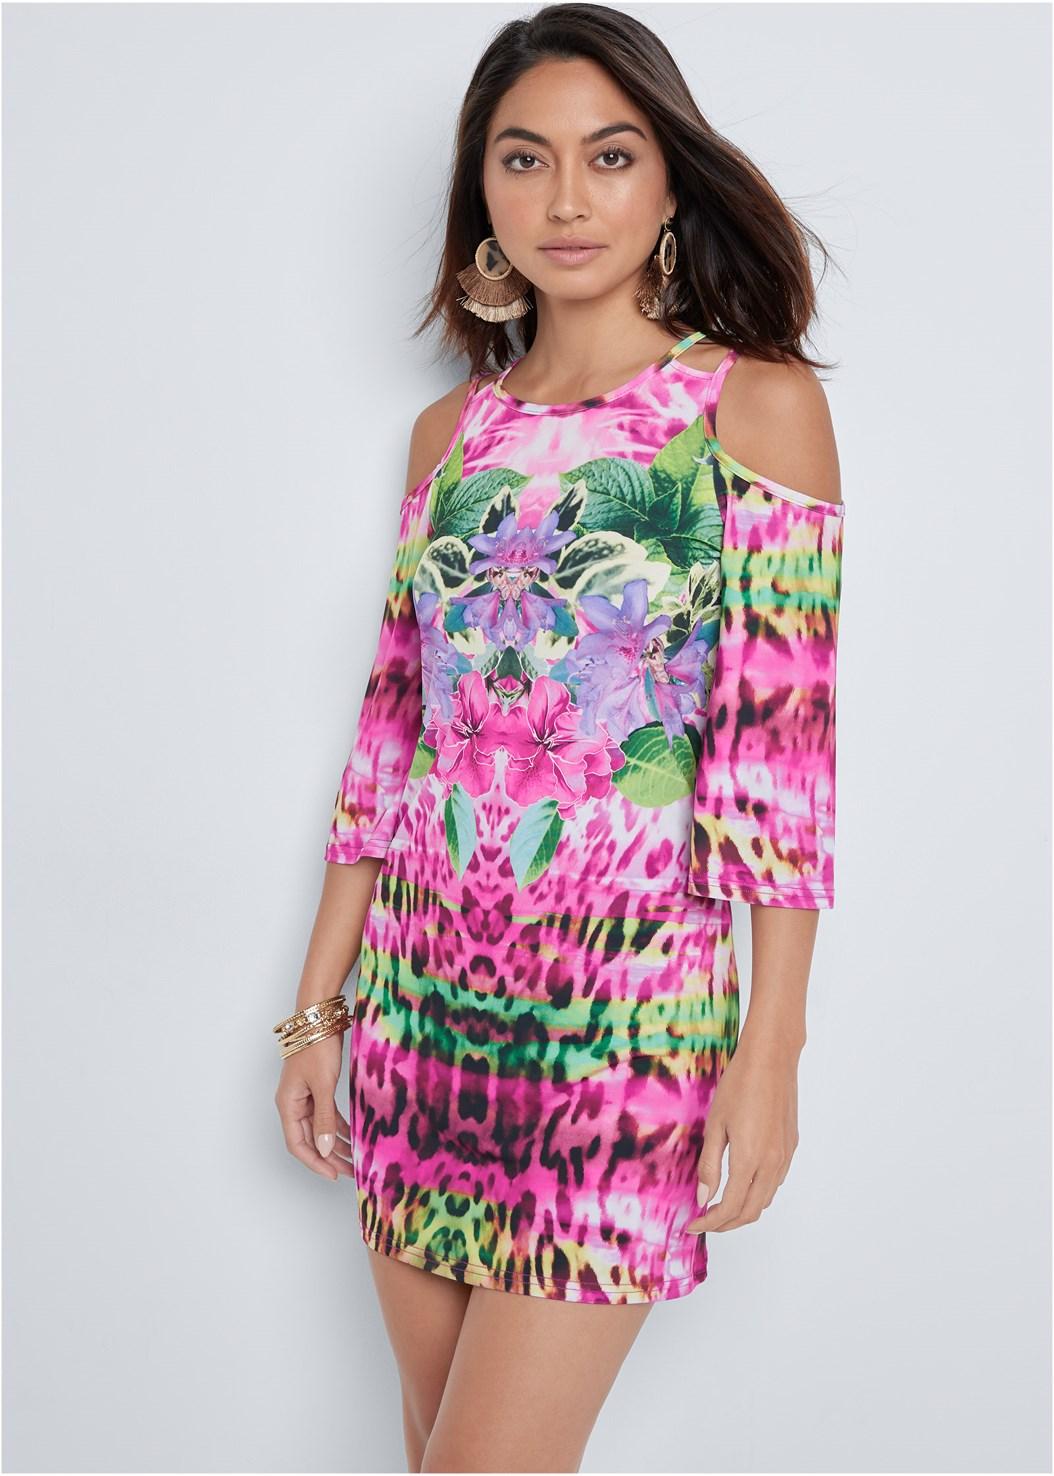 Cold Shoulder Print Dress,Jewel Toe Loop Lucite Sandal,Tortoise Fringe Earrings